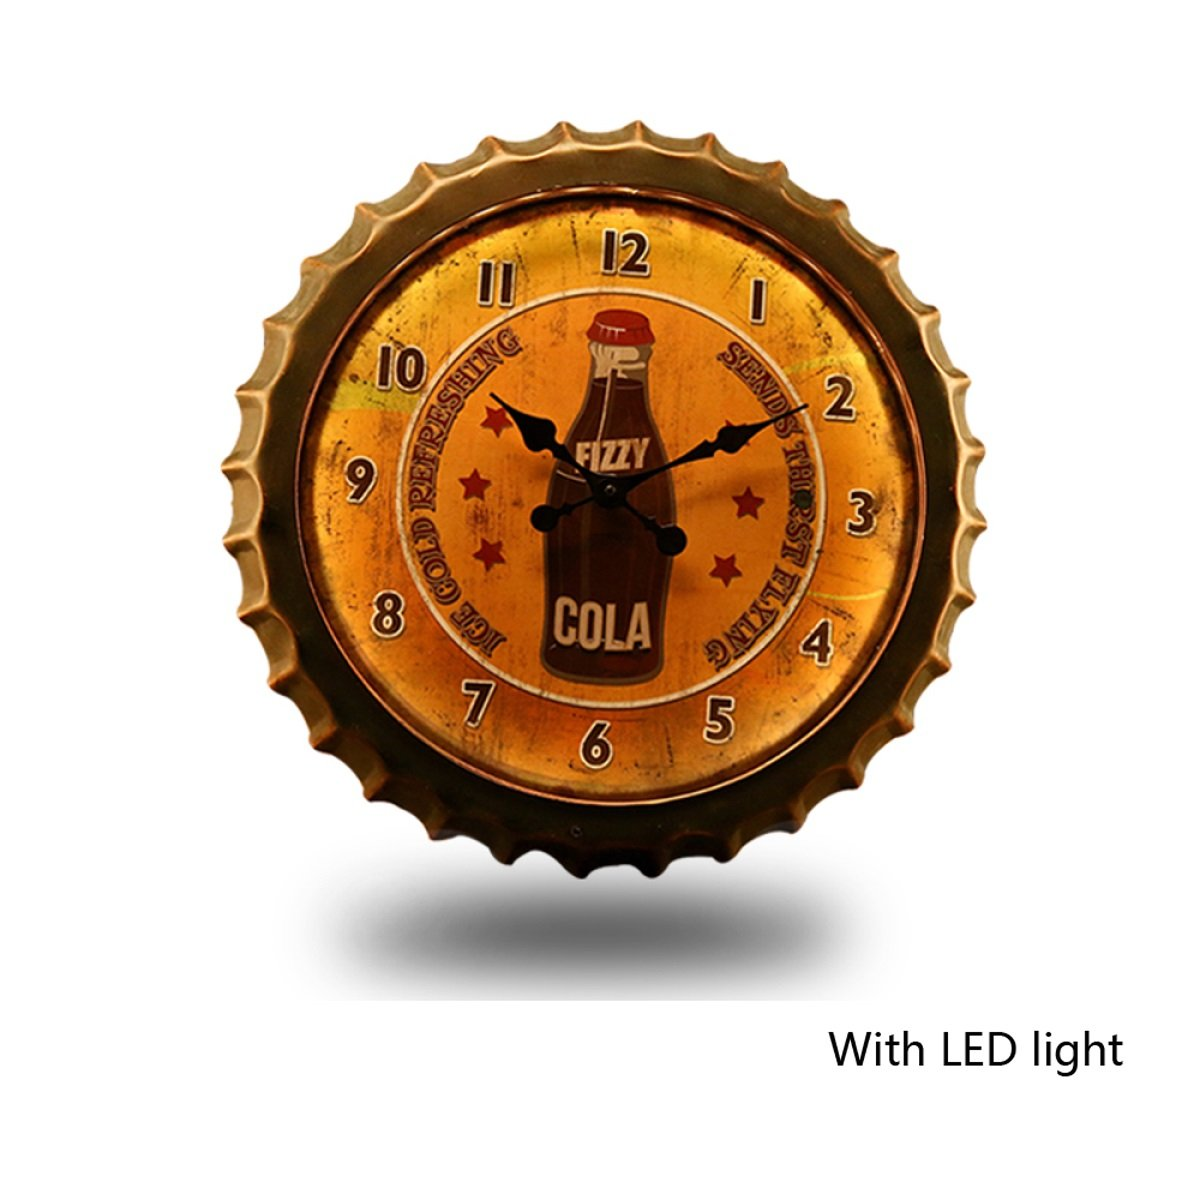 WAZY ウォールクロックアメリカンヴィンテージアイアンクリエイティブビールカバーバーカフェウォールデコレーションペンダントサイレントクロック(1つのパッキングの有無) (色 : A) B07DVCJ5PB A A